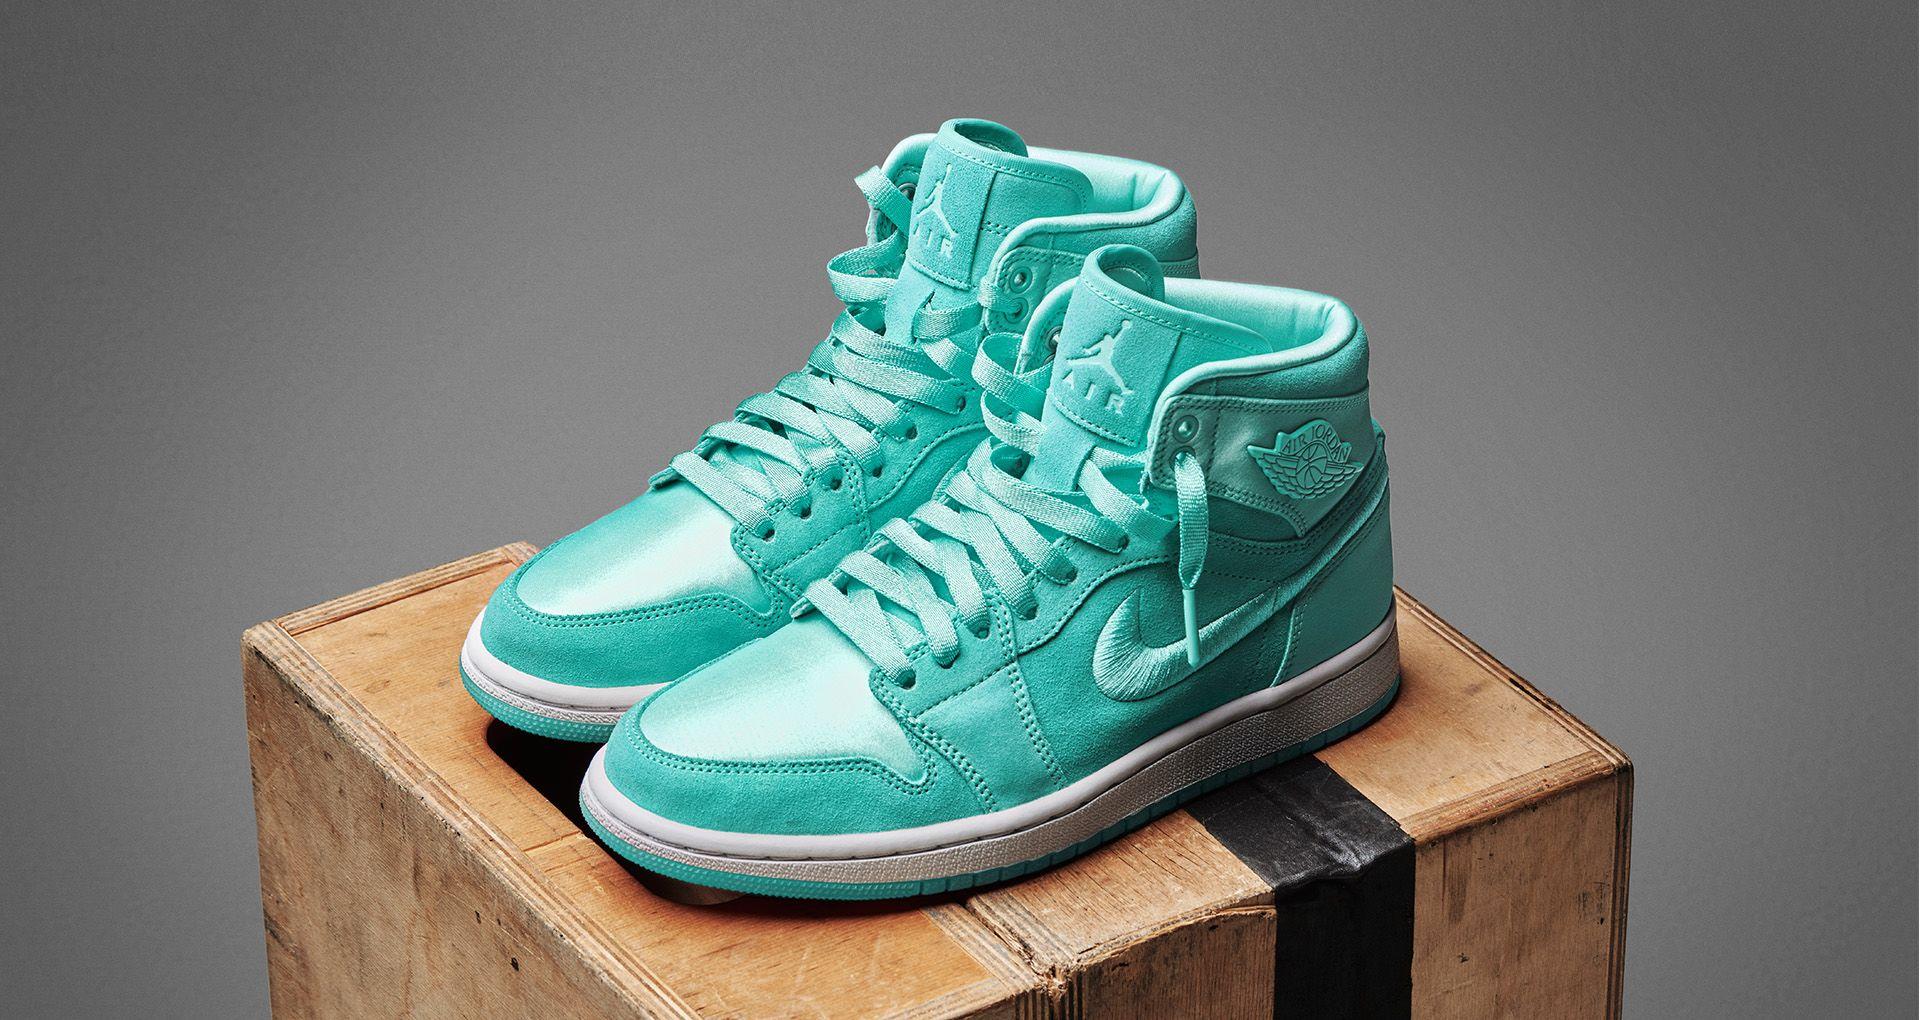 Women s Air Jordan 1 Retro High  Light Aqua  Release Date. Nike+ SNKRS 811a88a67f